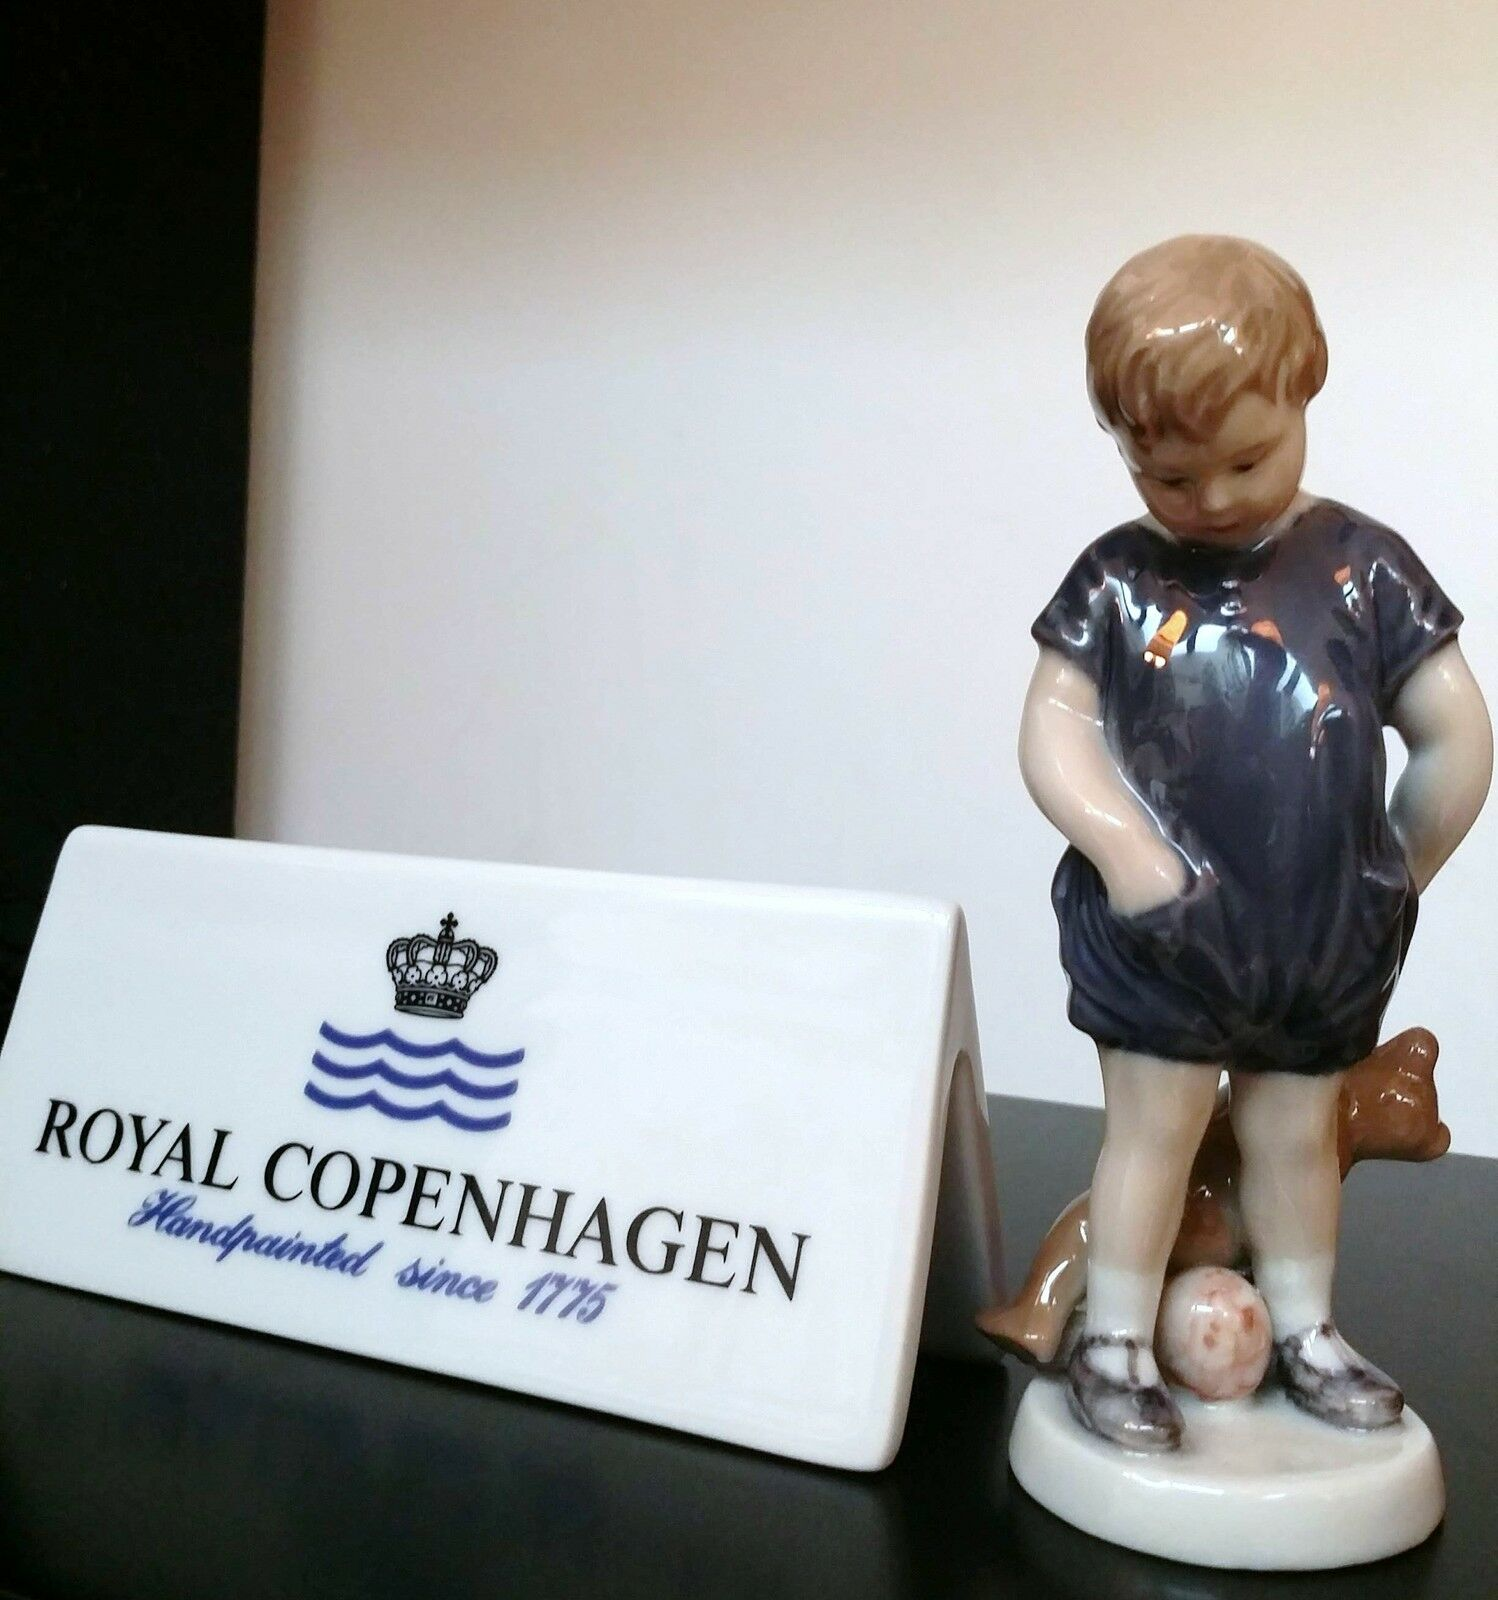 Royal Copenhagen Figurine Figurine Figurine - Bimbo Con Orsetto Mini - Royal Copenhagen Statuina c64d94